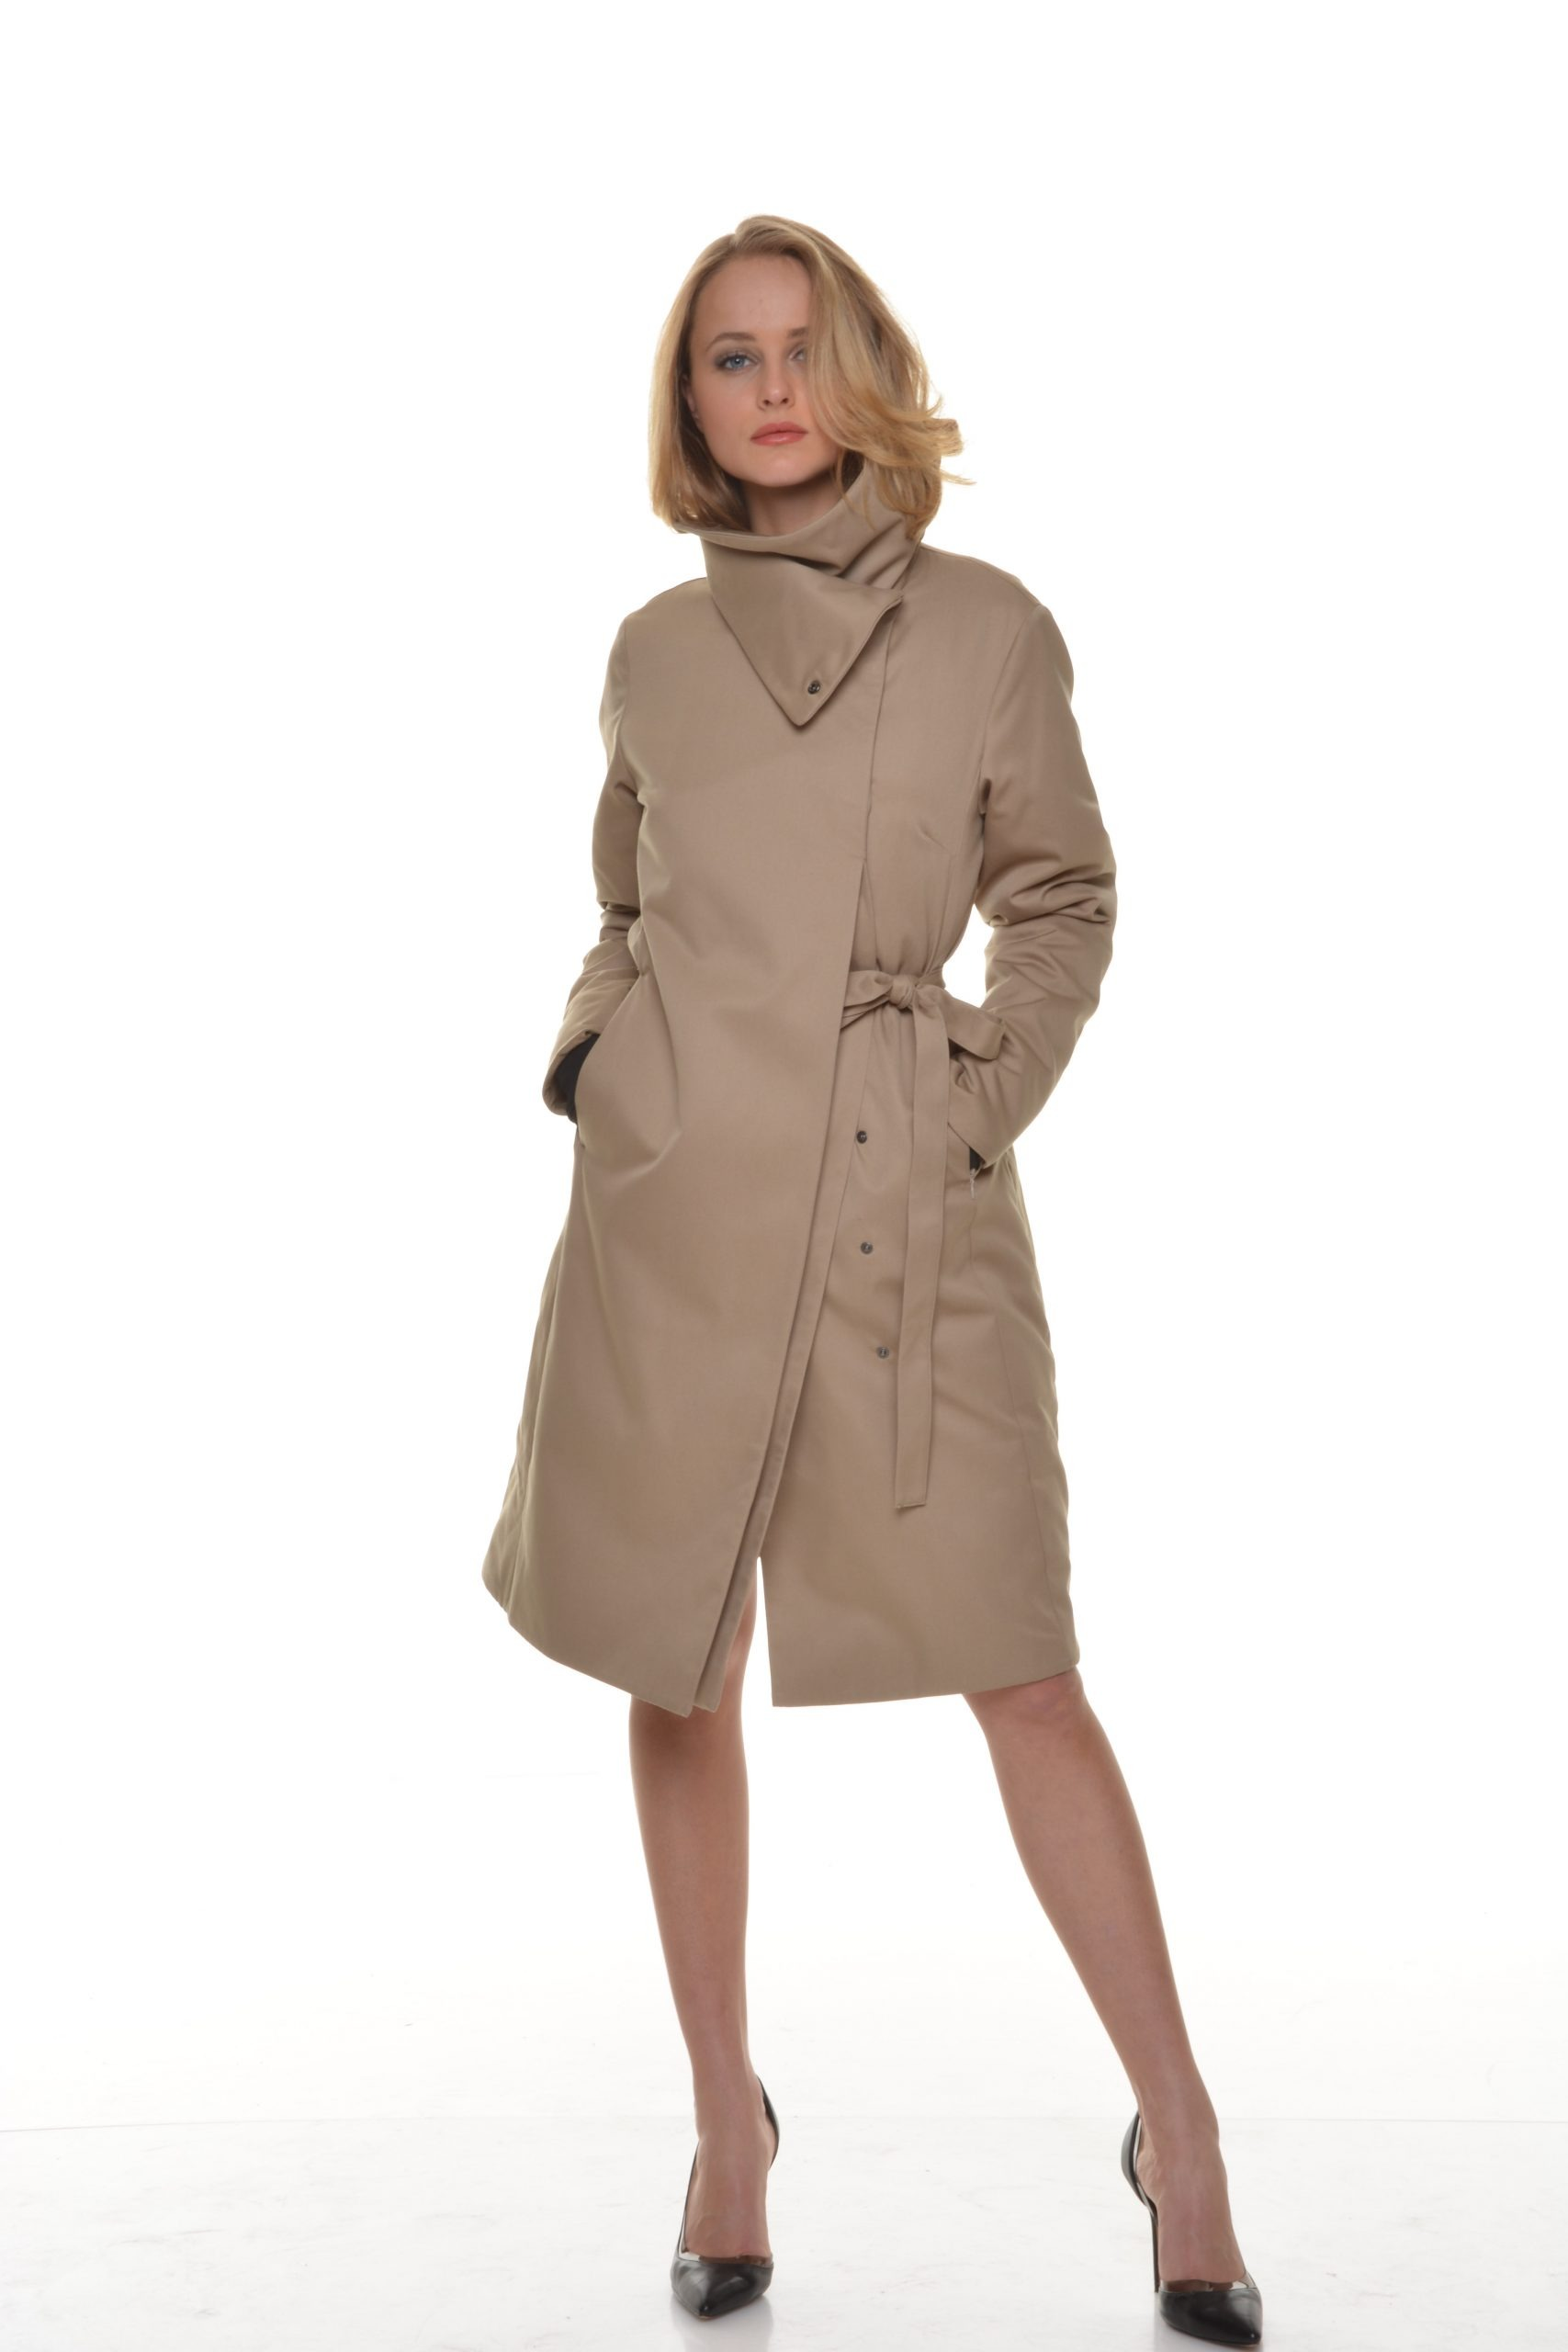 couture raincoats